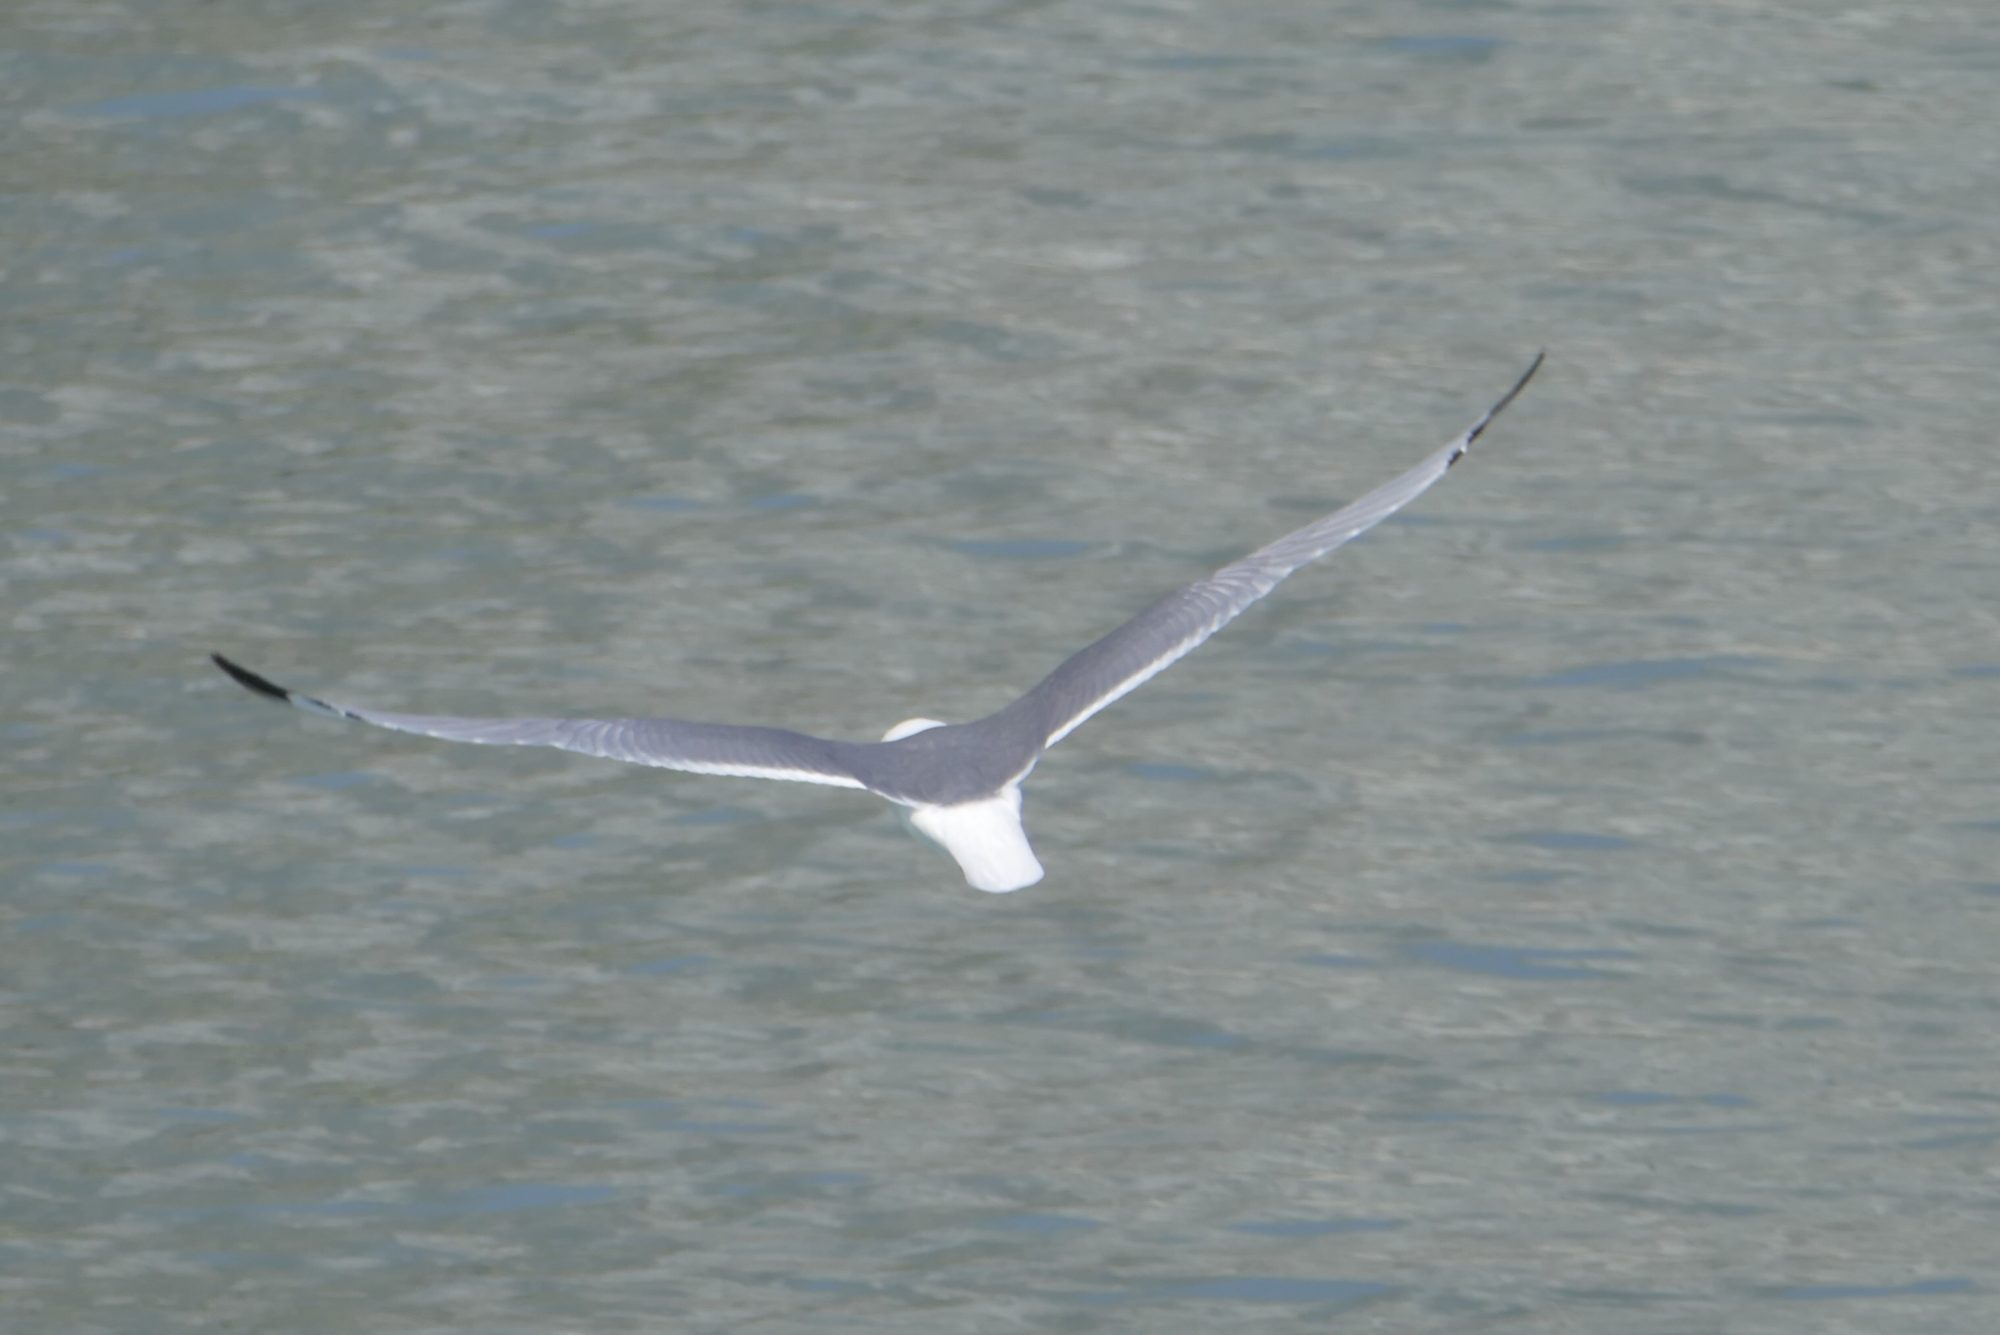 Kittiwake in flight, Glacier Bay. All photos copyright Doug Spencer.